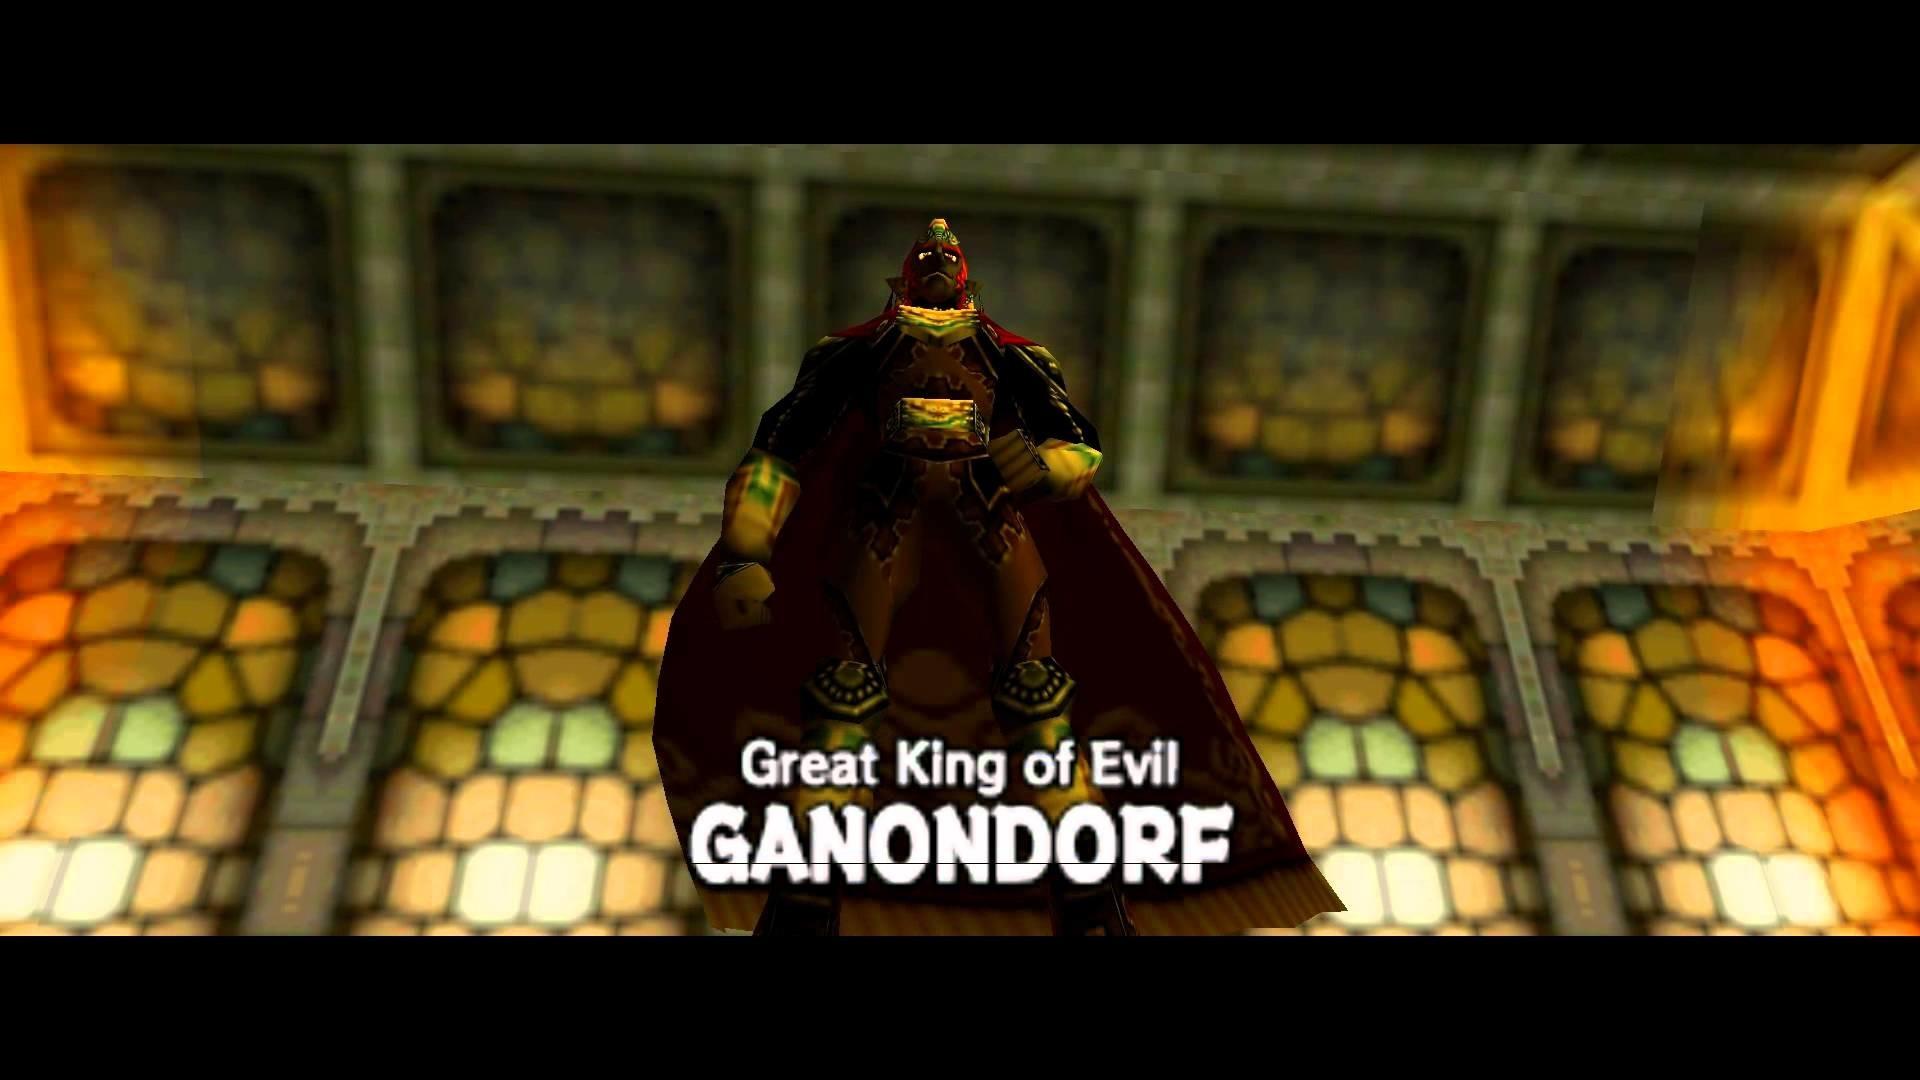 Legend of Zelda: Ocarina of Time – Boss: Great King of Evil Ganondorf [